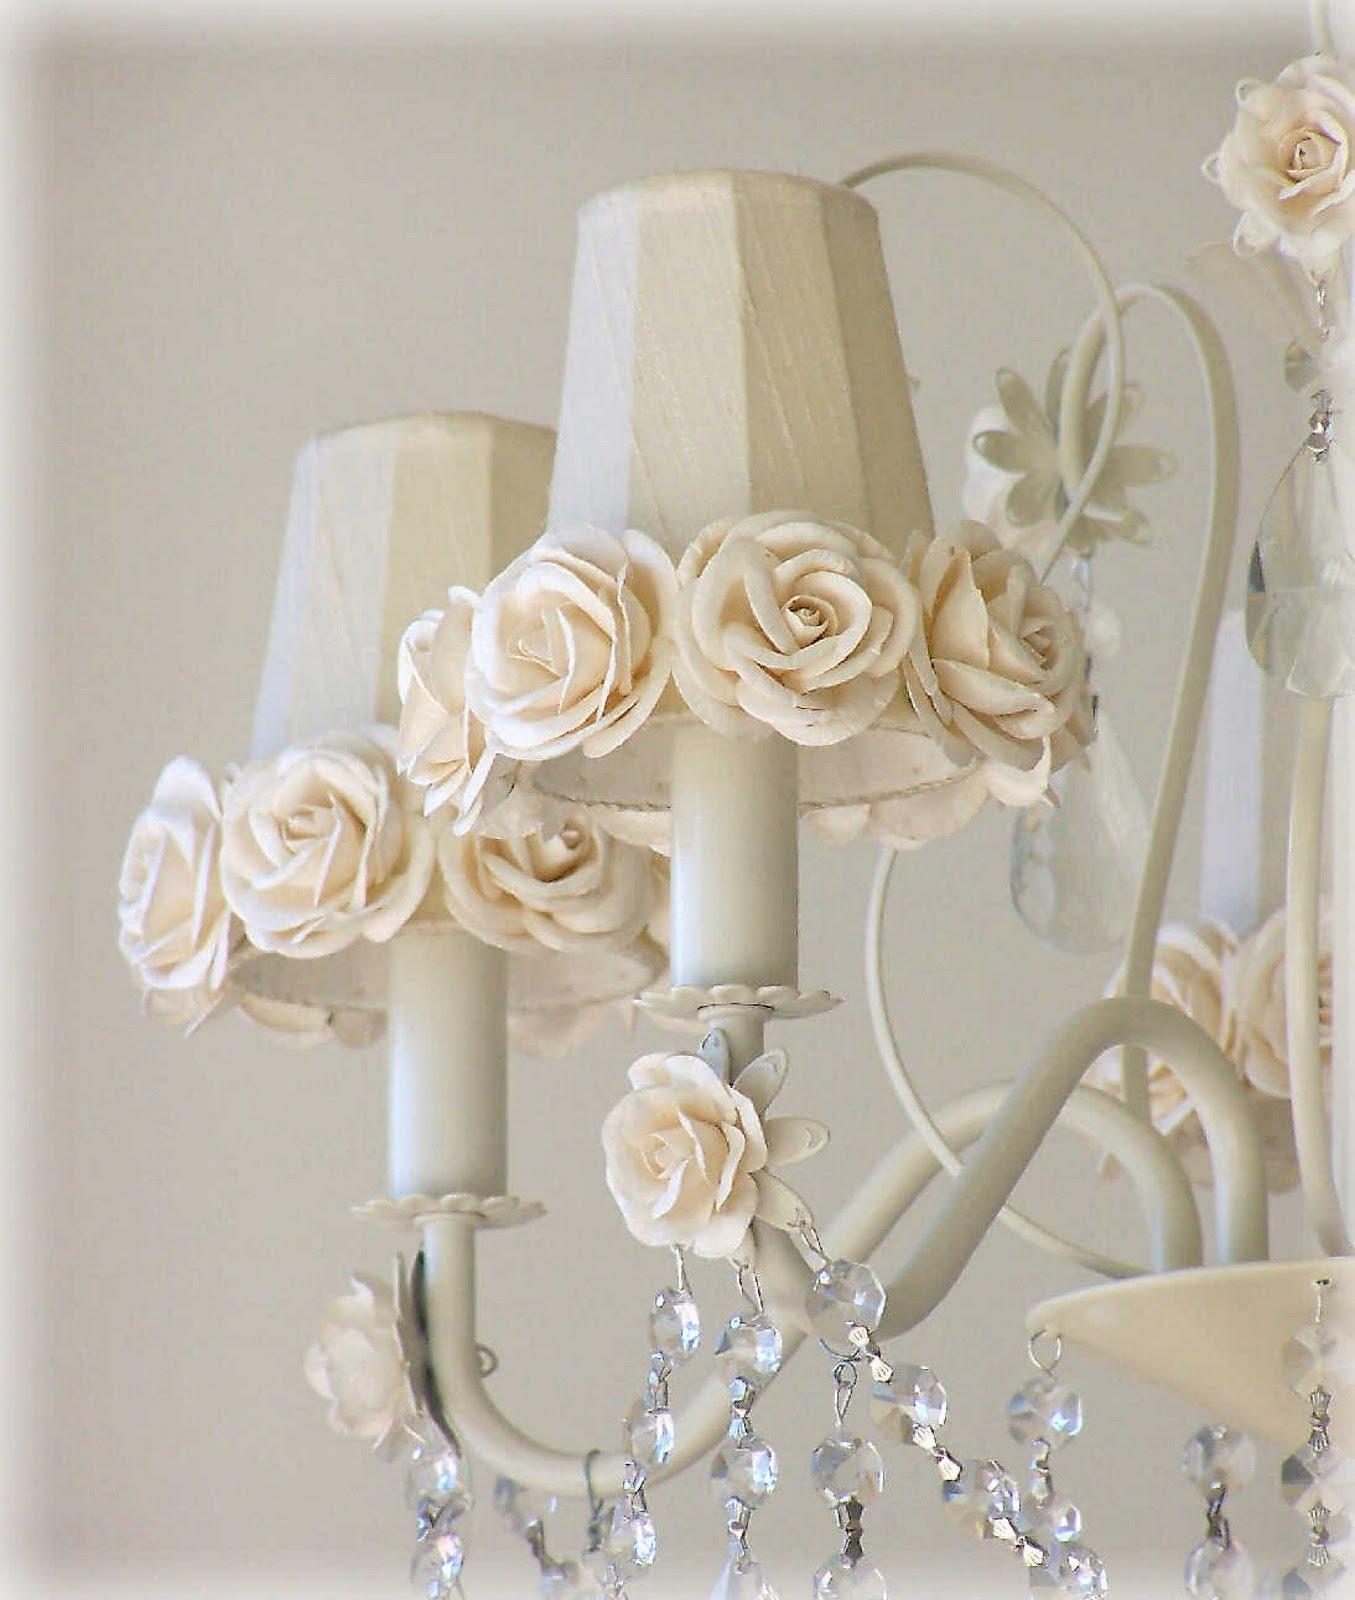 shabby chic crystal chandeliers chandelier online. Black Bedroom Furniture Sets. Home Design Ideas